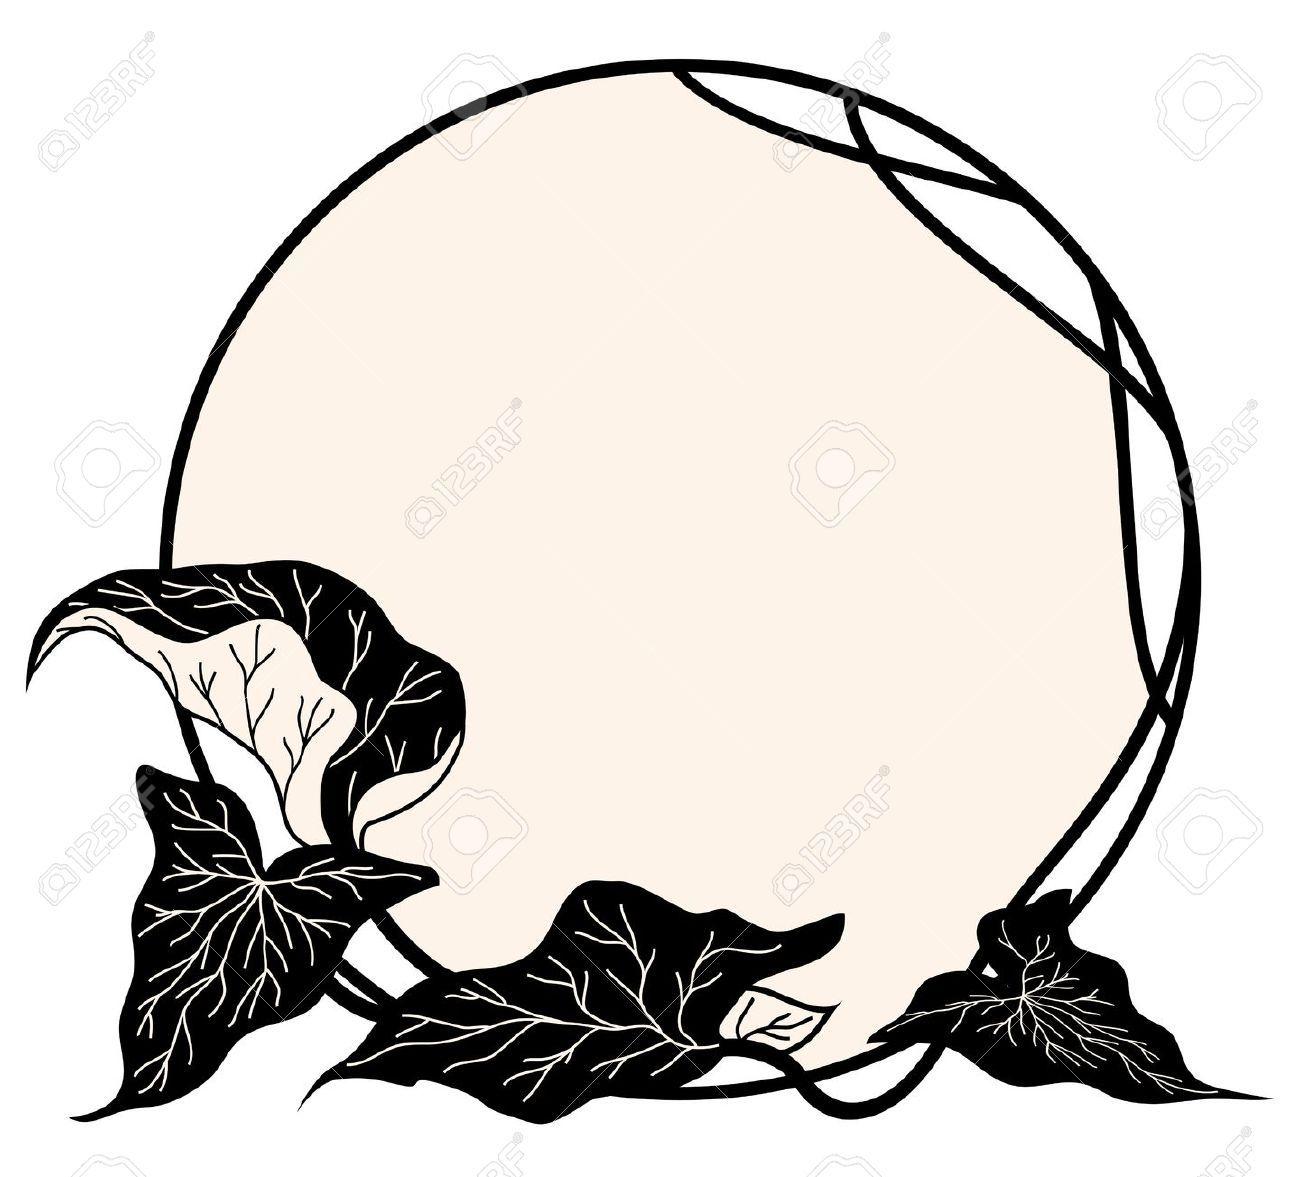 Circle nouveau bird google search tattoos pinterest - Art deco and art nouveau ...